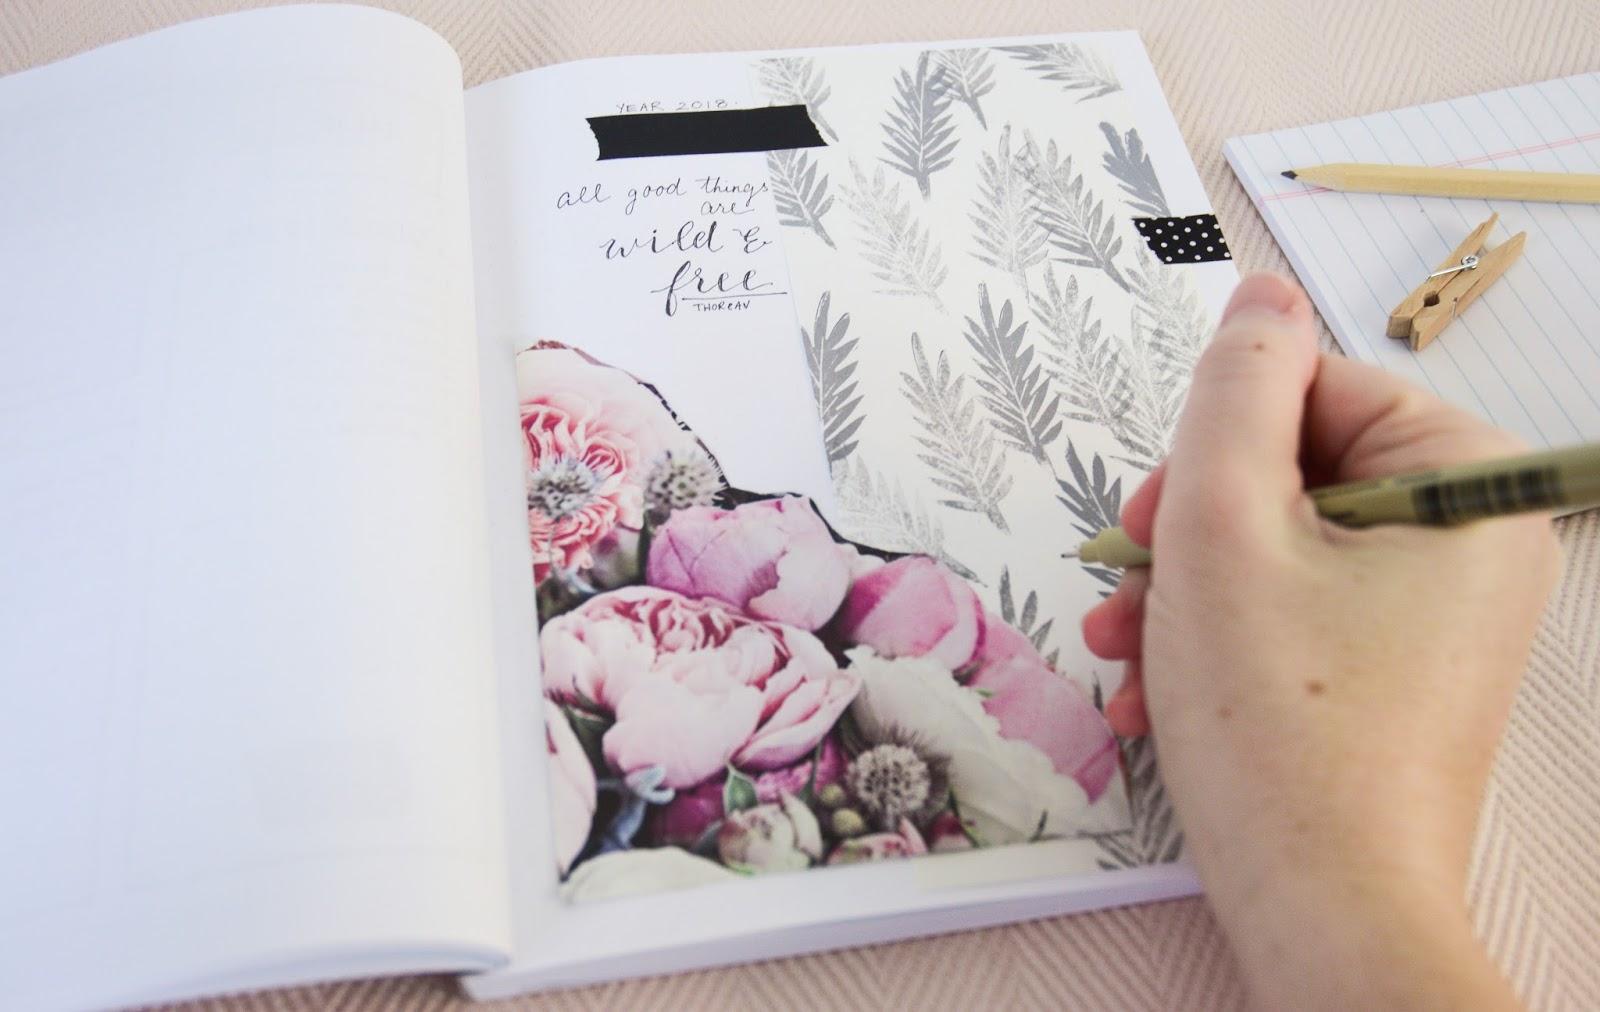 Shayda Campbell: January BuJo + Free Stickers